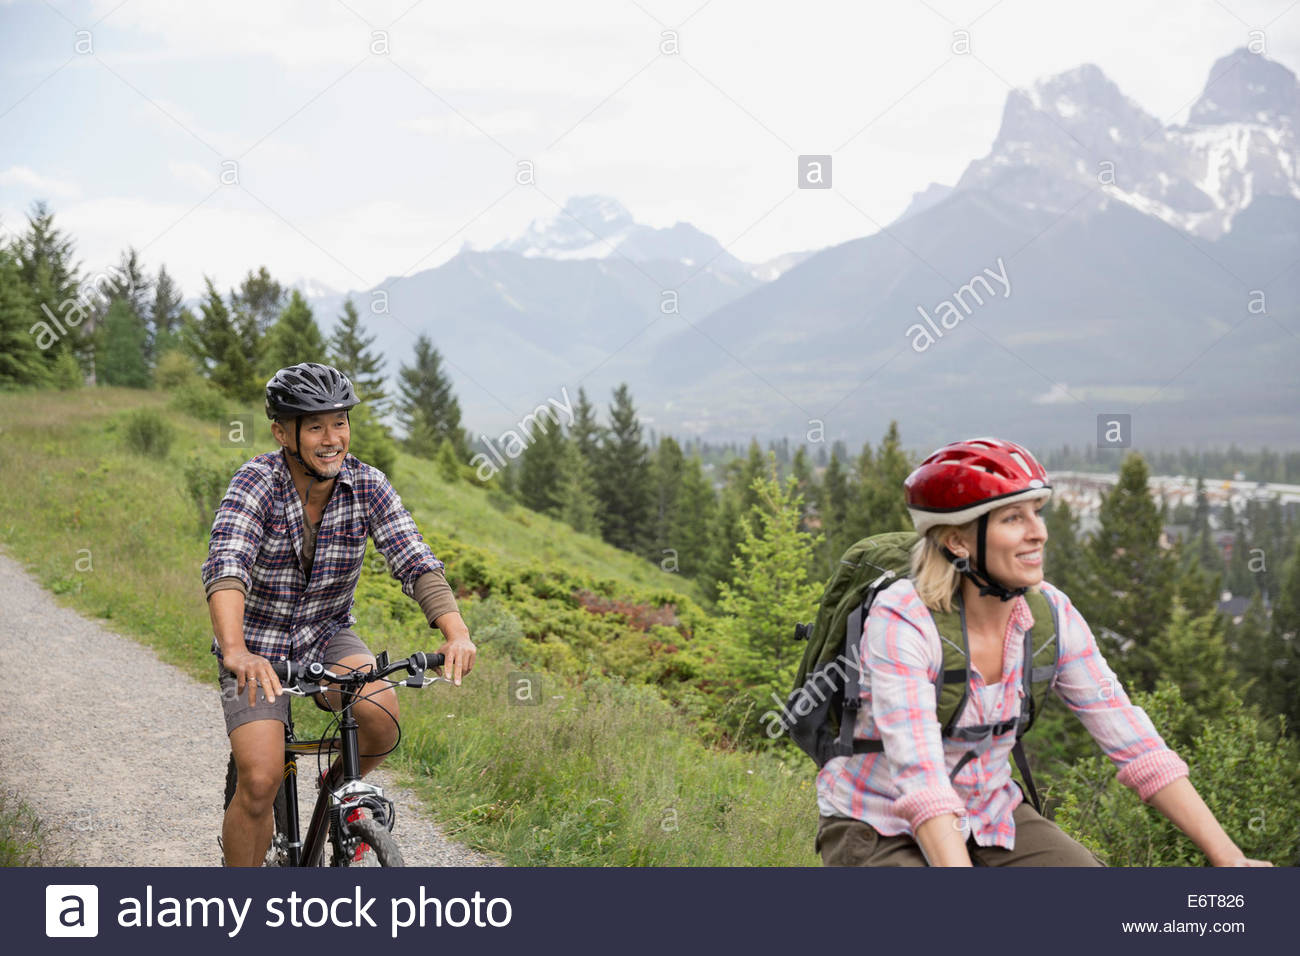 Couple riding mountain bikes on hillside - Stock Image